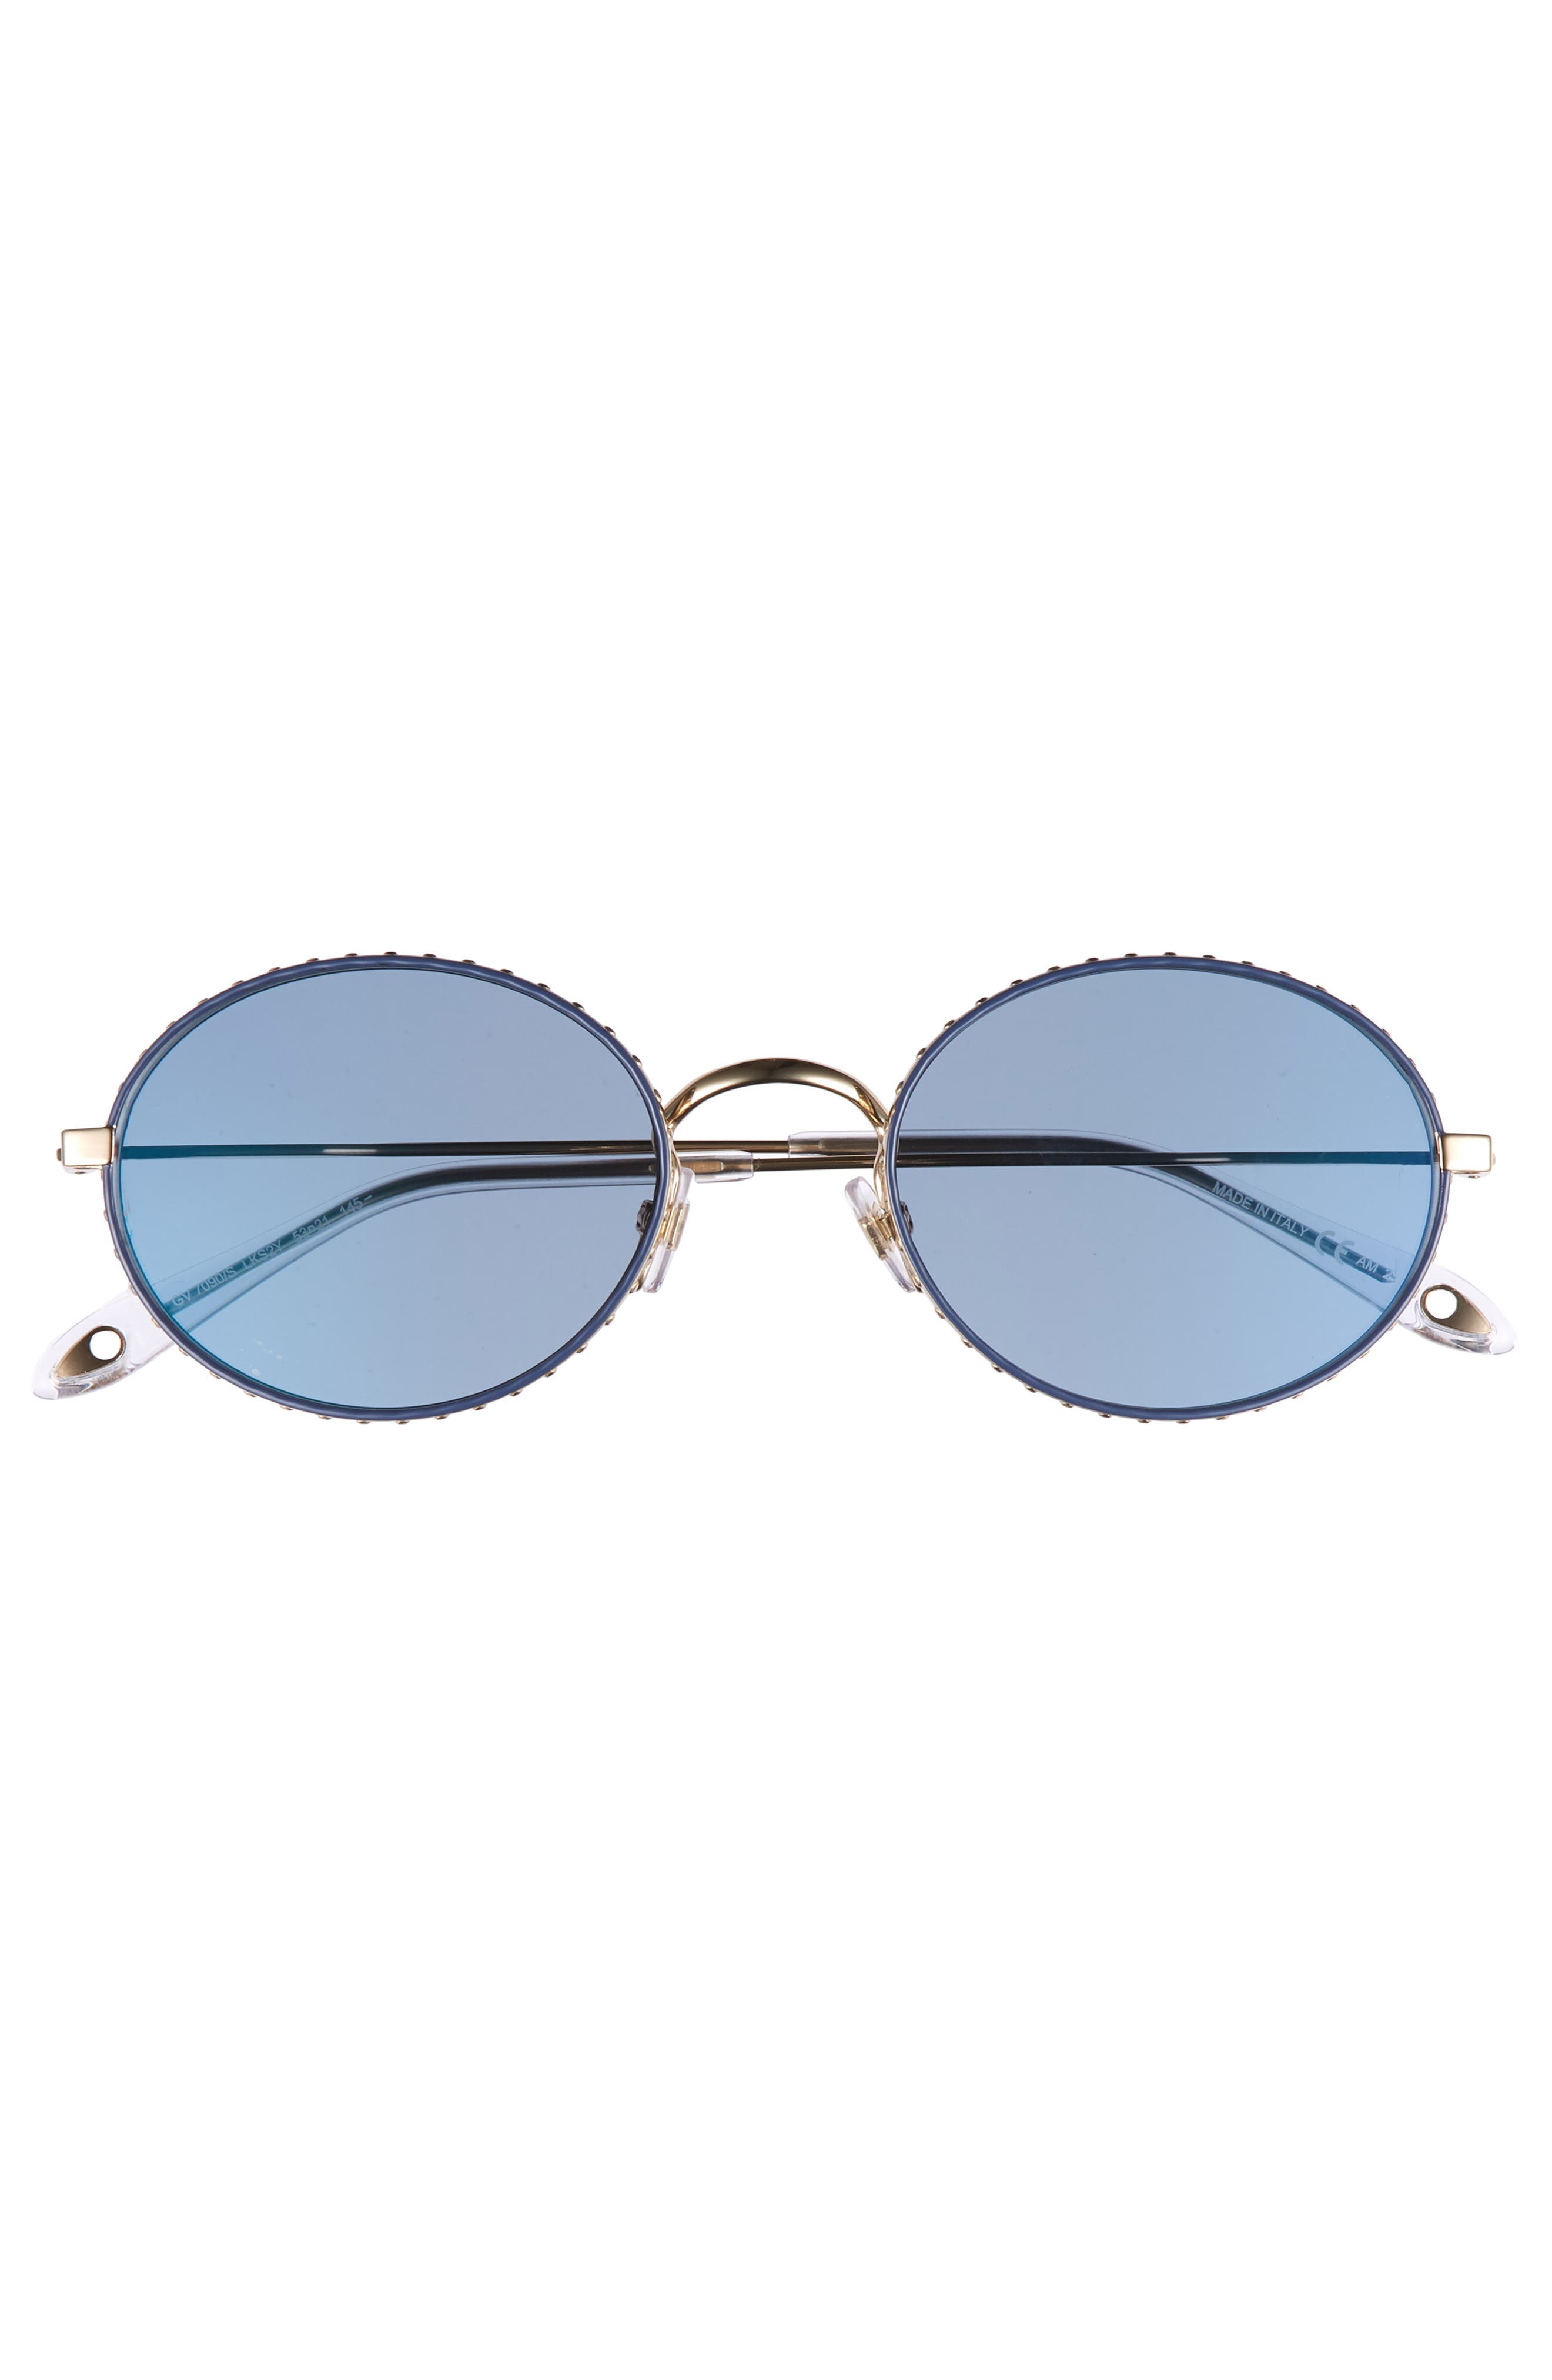 53mm Oval Sunglasses,                             Alternate thumbnail 3, color,                             GOLD/ BLUE